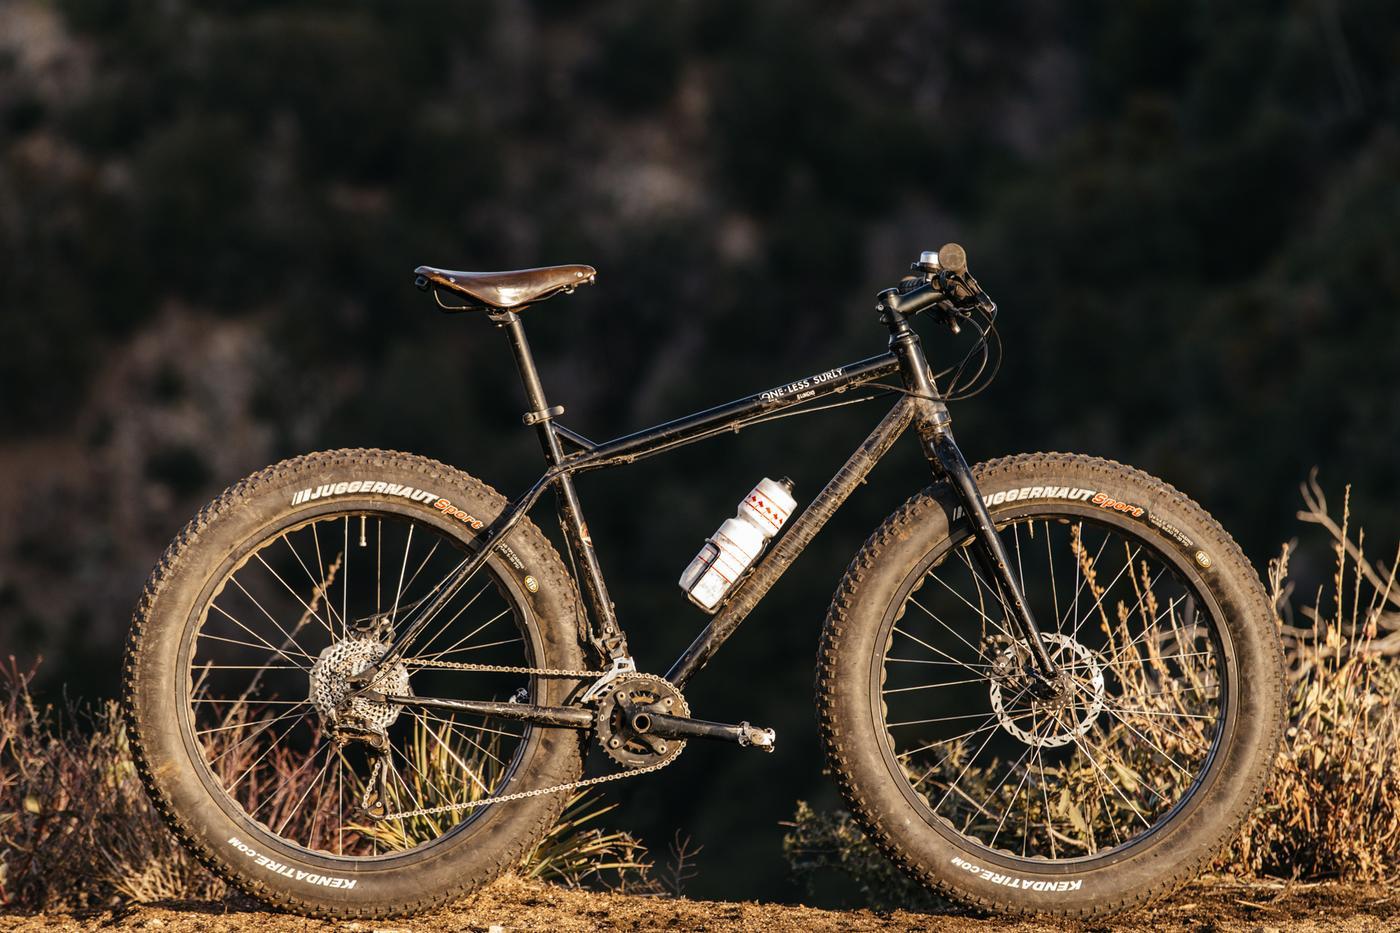 Spencer's Motobecane Fatbike on Strawberry Peak